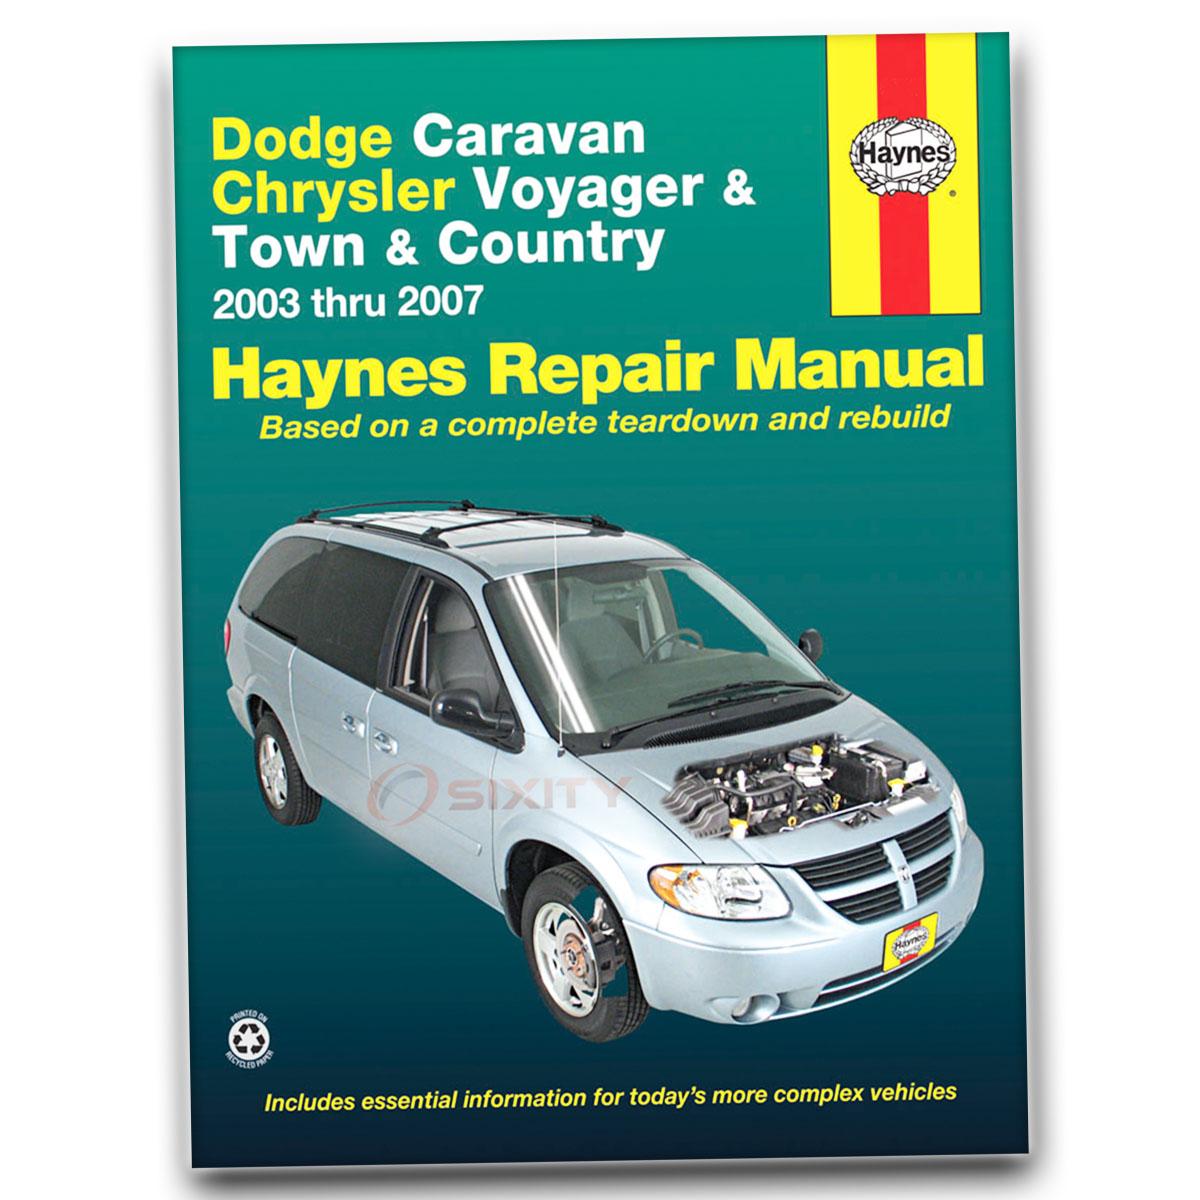 chrysler town country van haynes repair manual lxi touring rh ebay com 2007 chrysler town and country service manual 2007 chrysler town and country manual